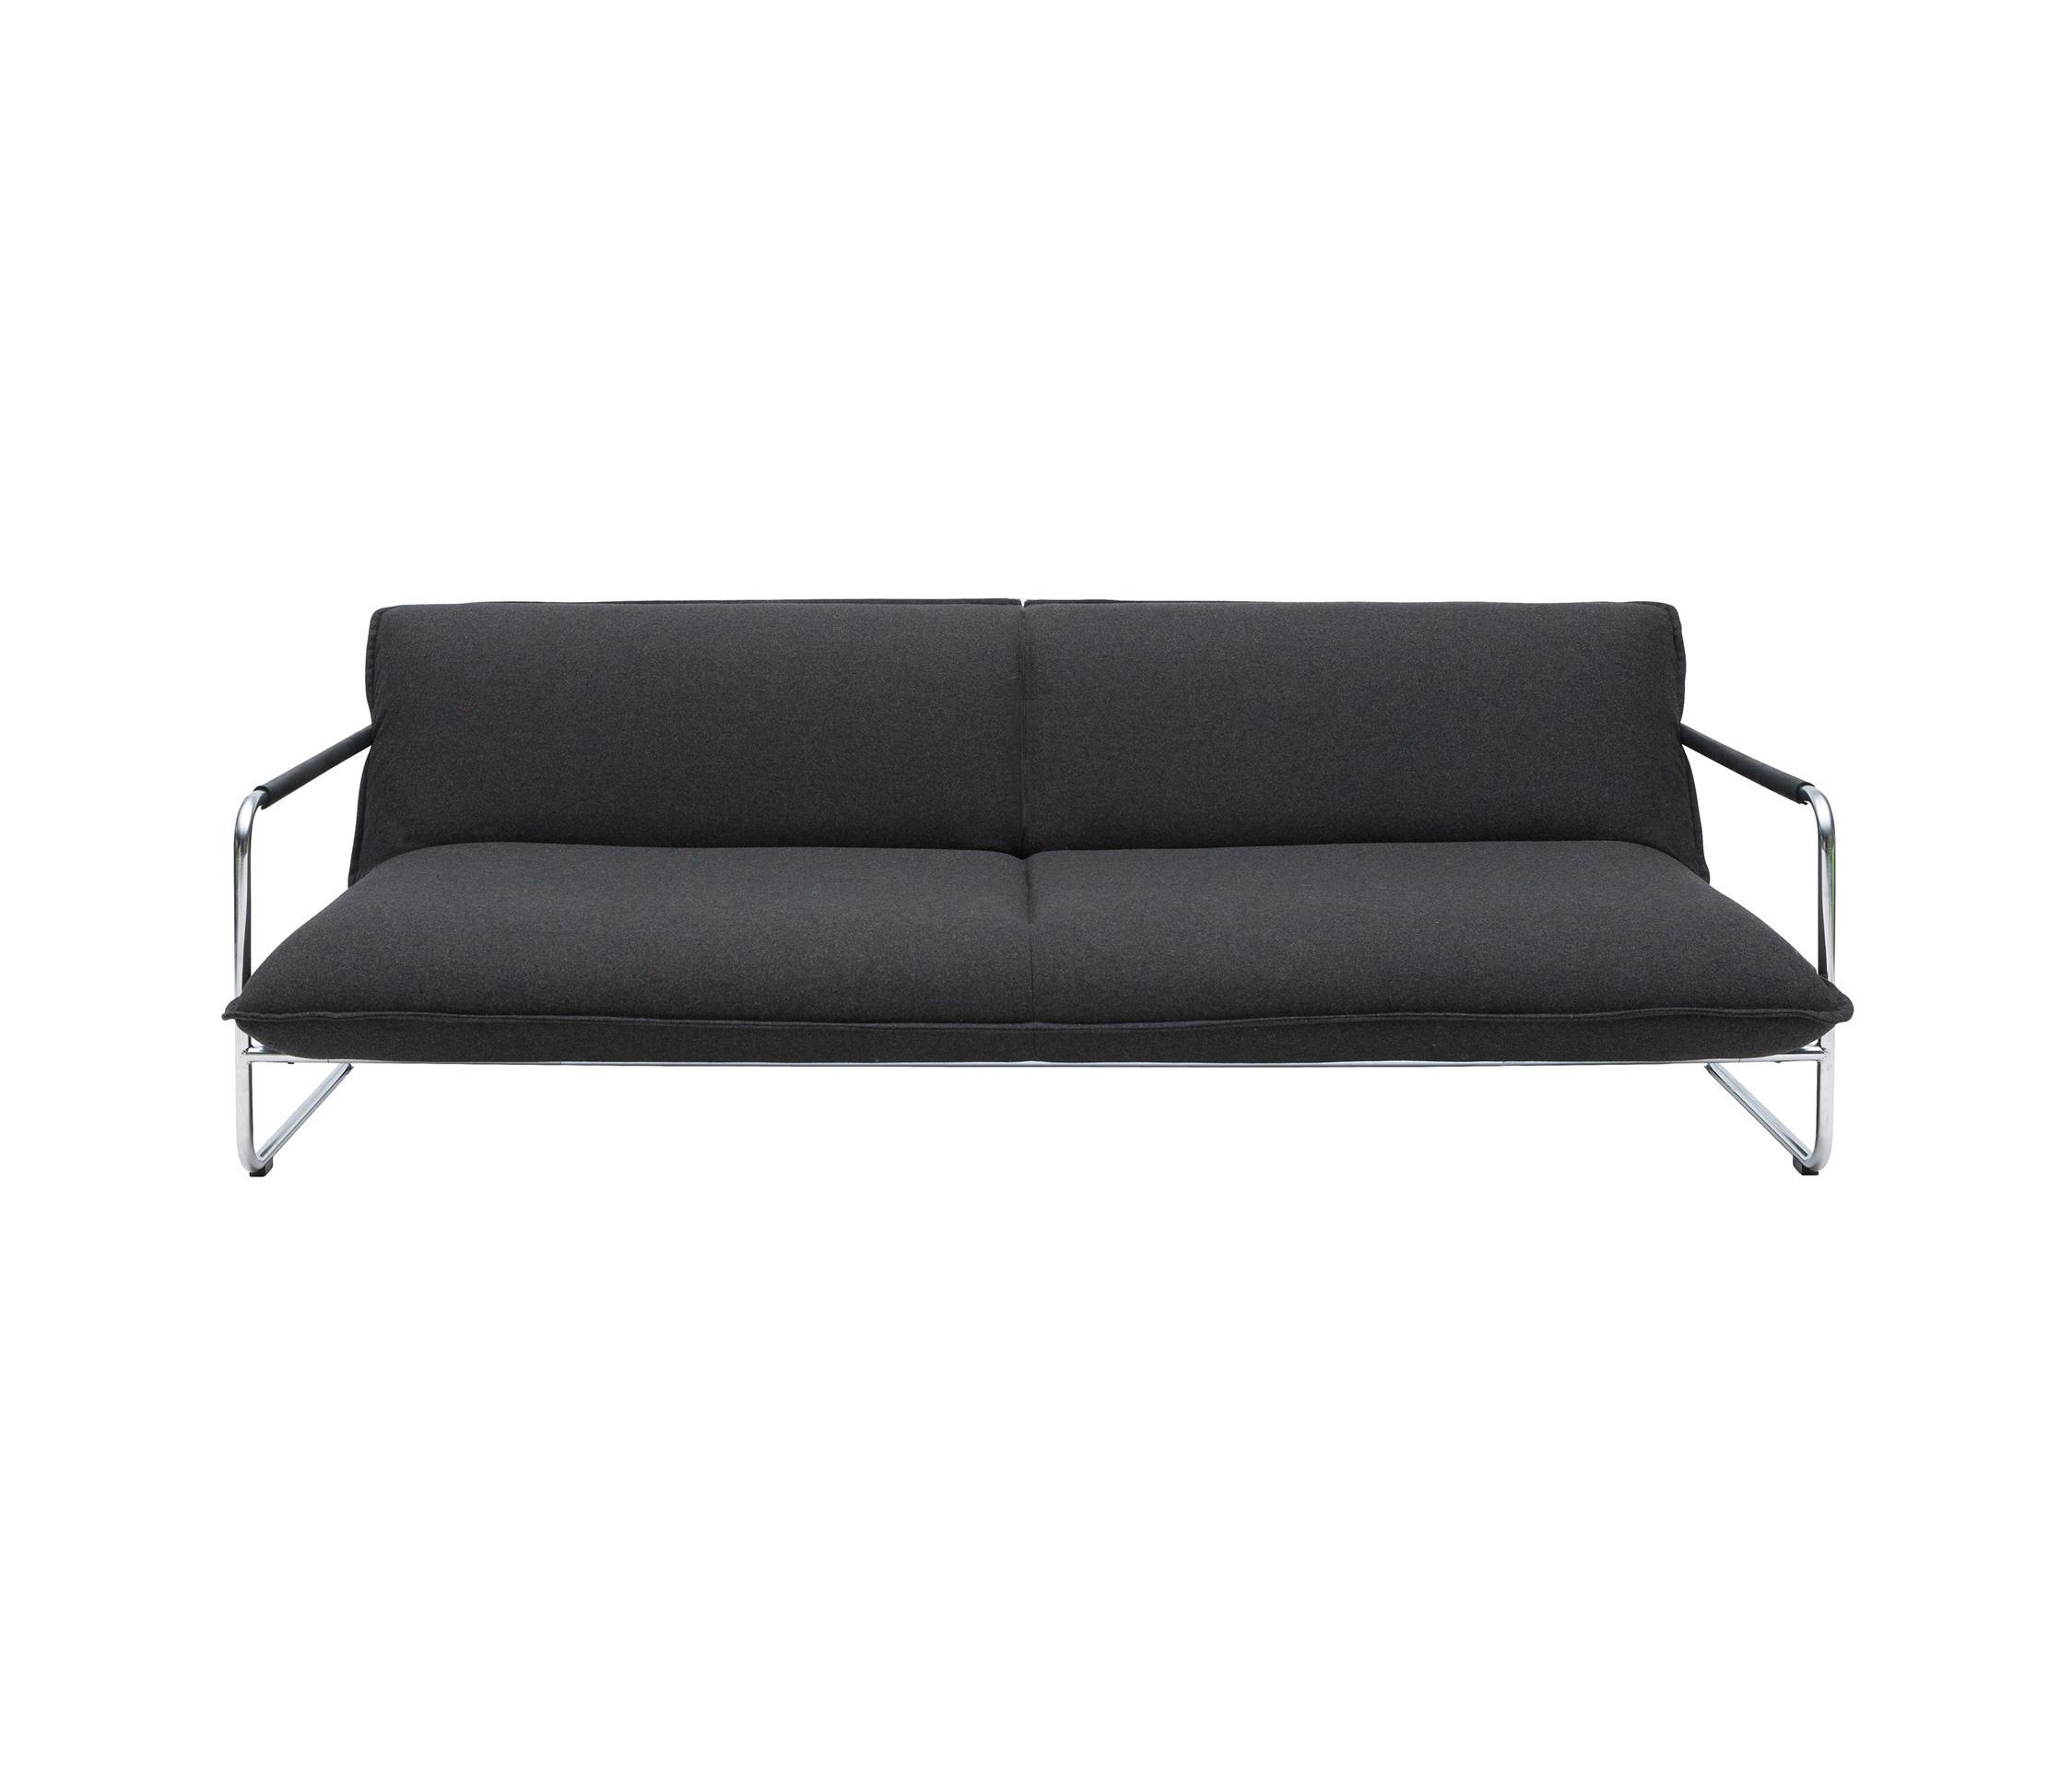 NOVA Sofa beds from Softline AS Architonic